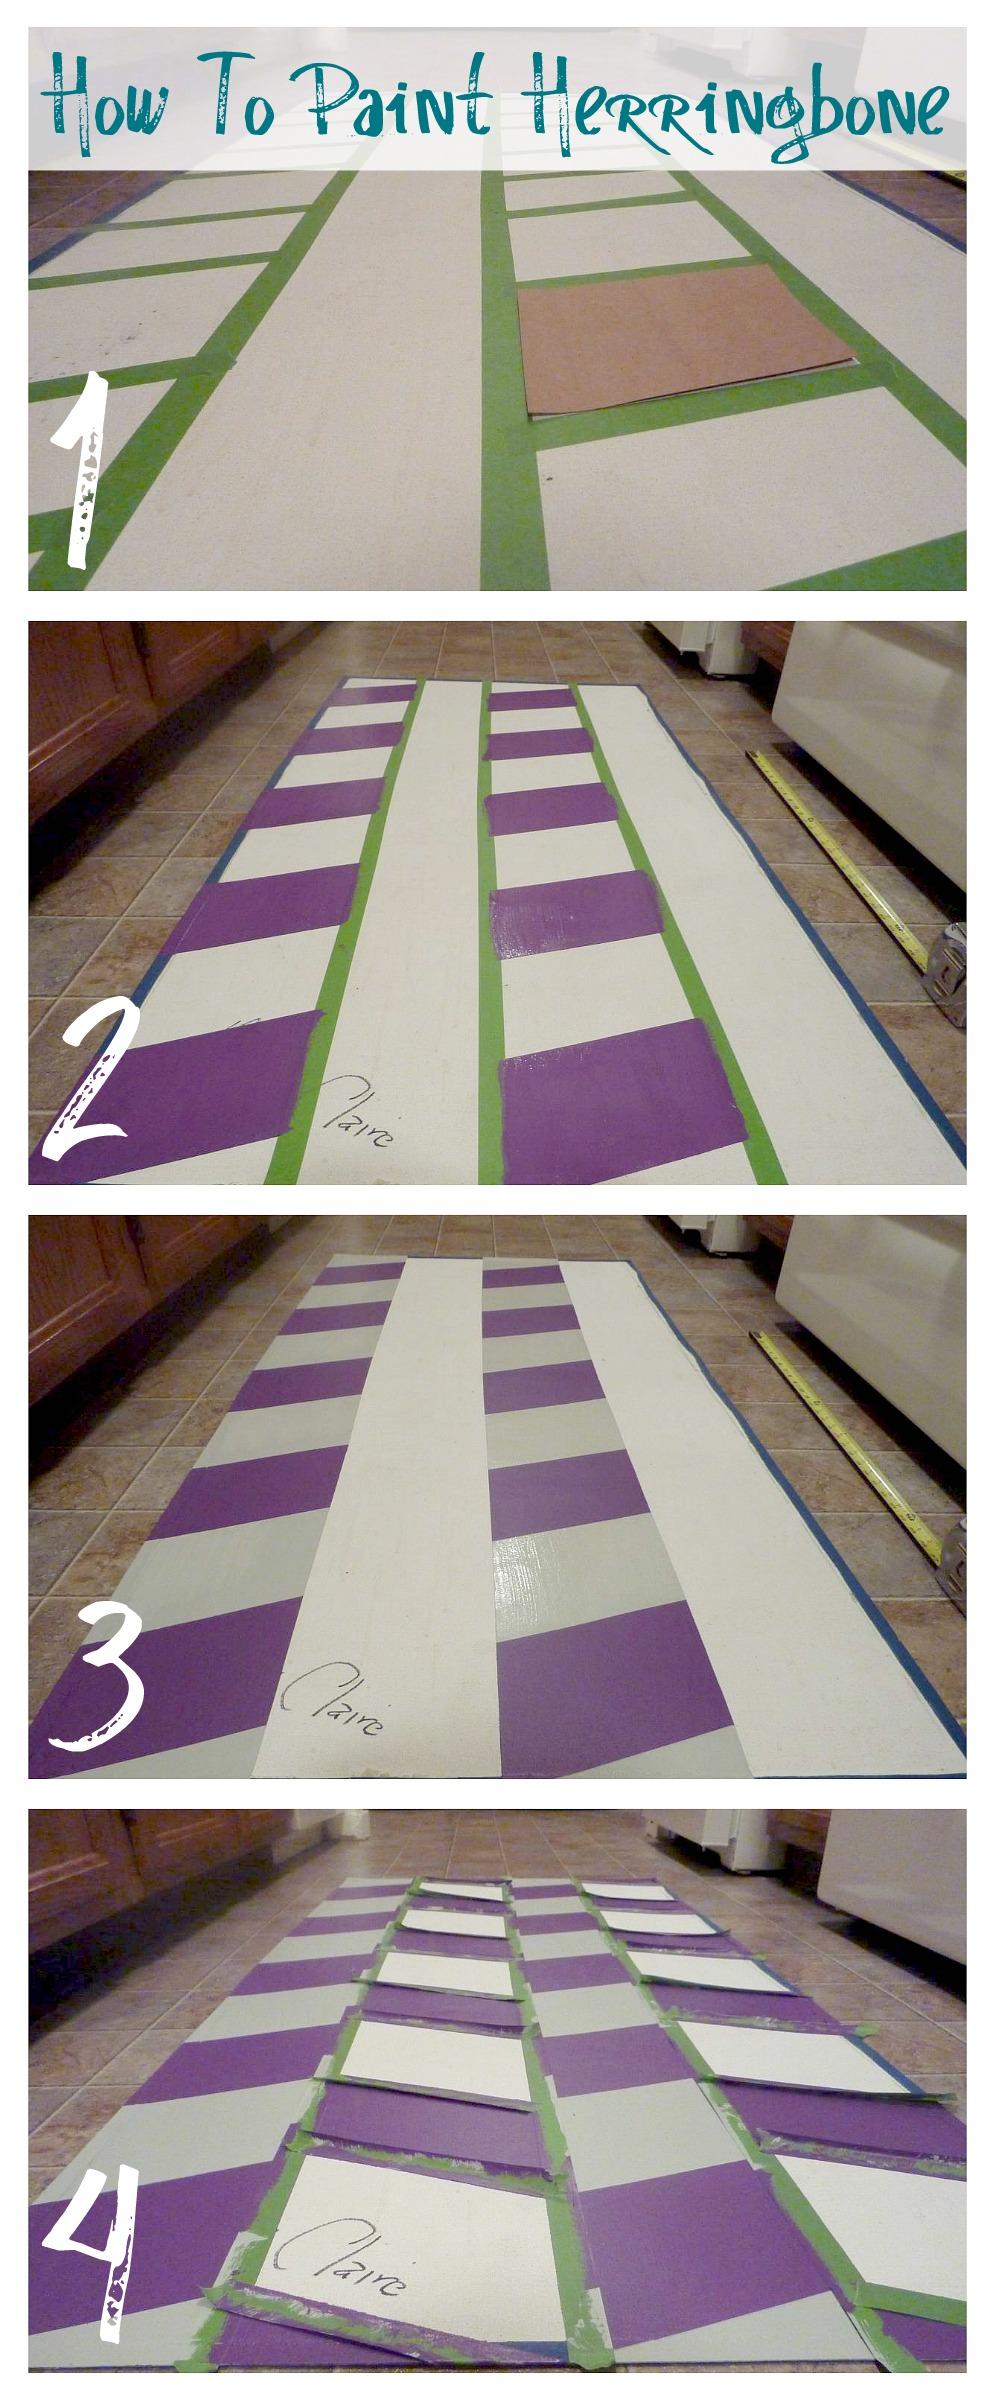 How to Paint a Herringbone Pattern